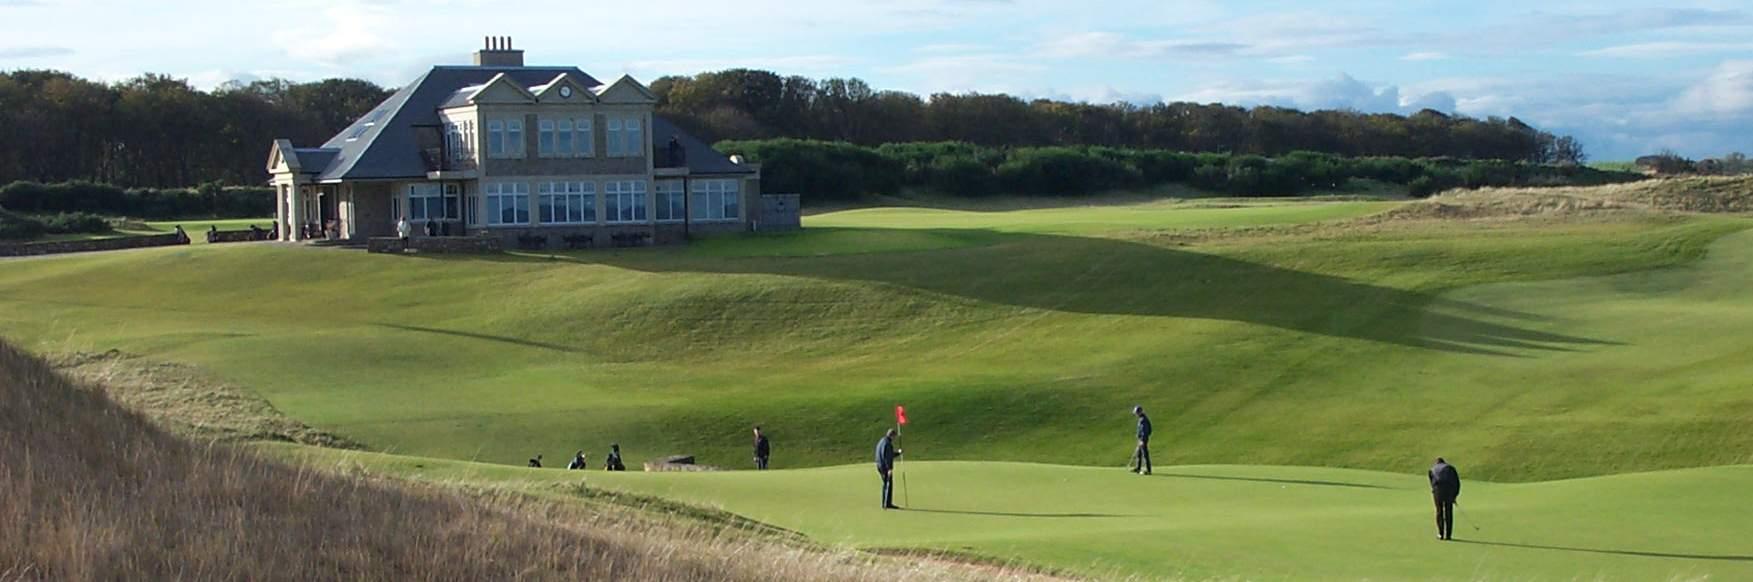 Golf in Glasgow Scotland